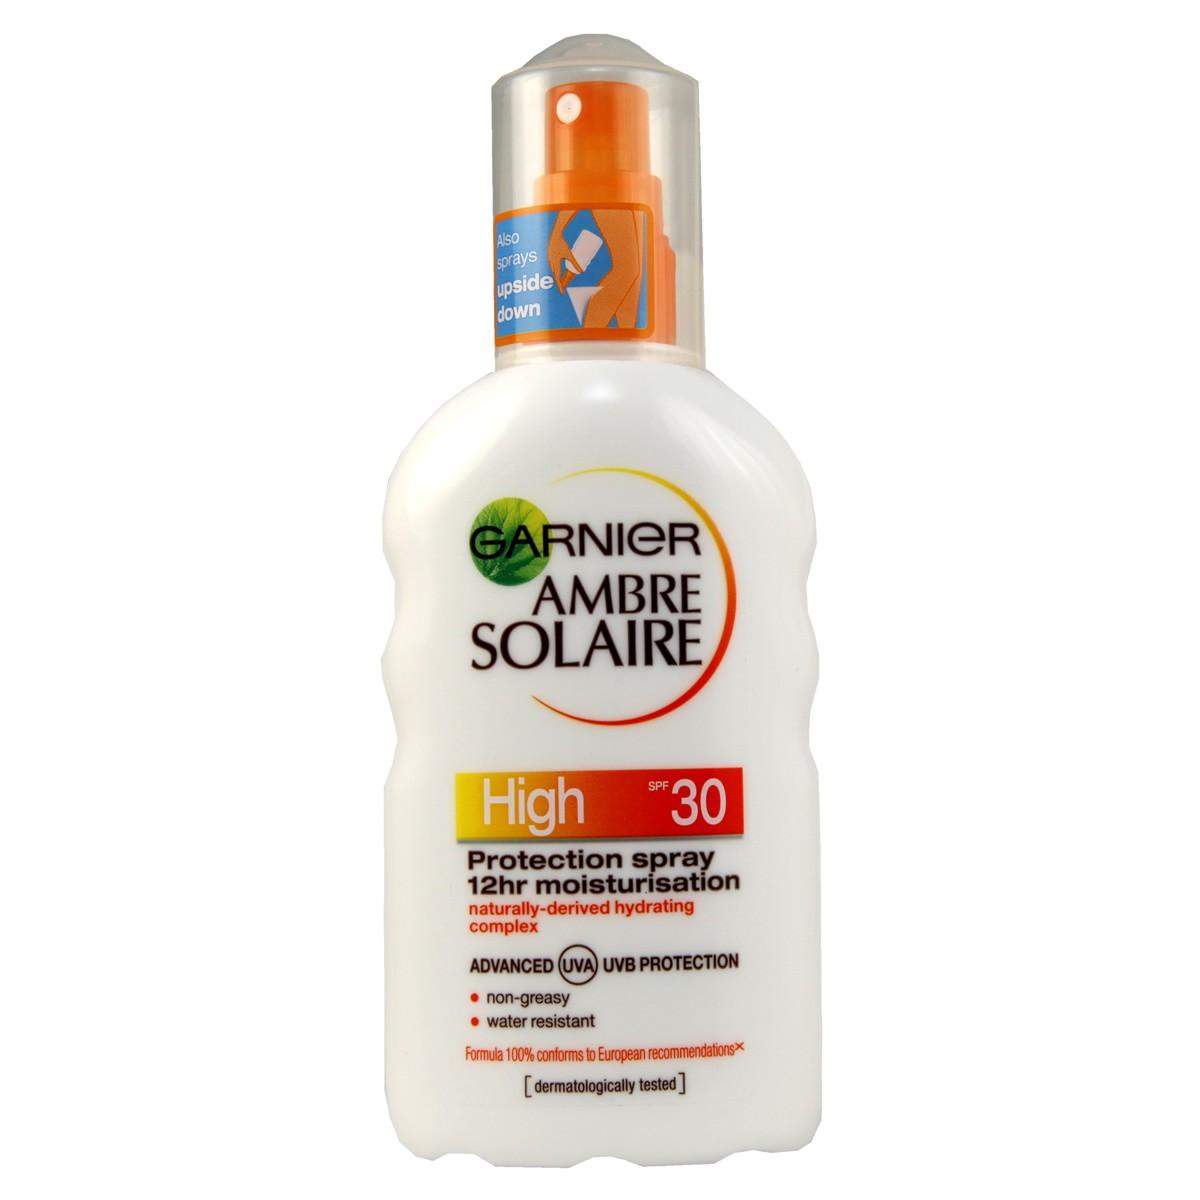 Garnier Ambre Solaire Moisturising Protection Spray SPF 30